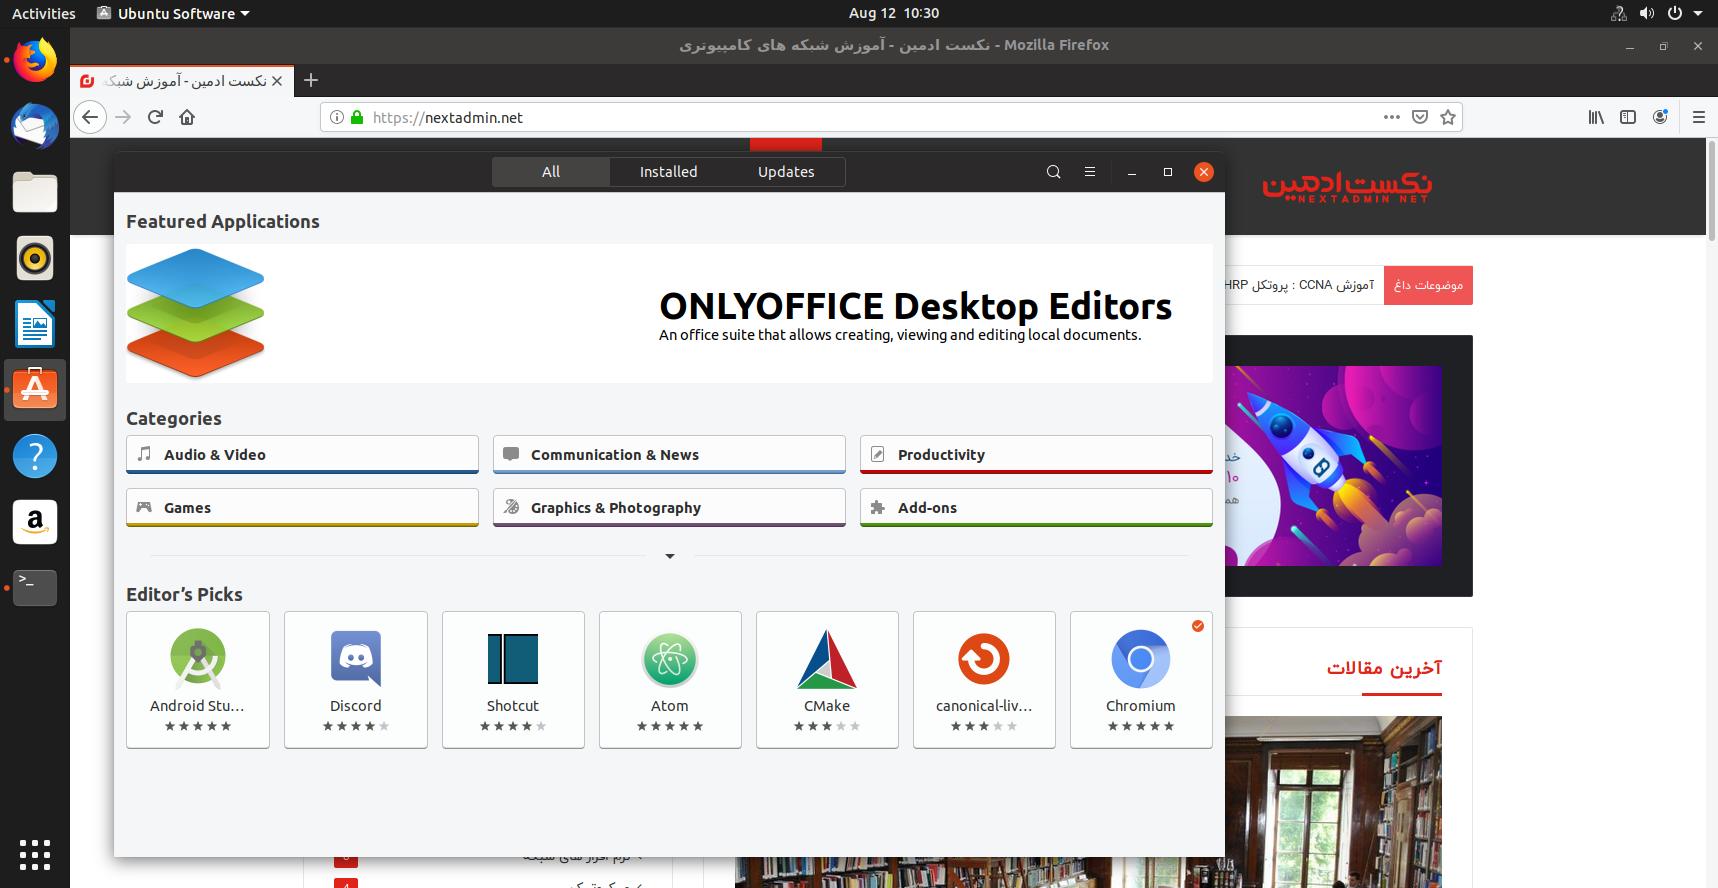 Ubuntu Software Center | استفاده از مدیر بسته دبیان